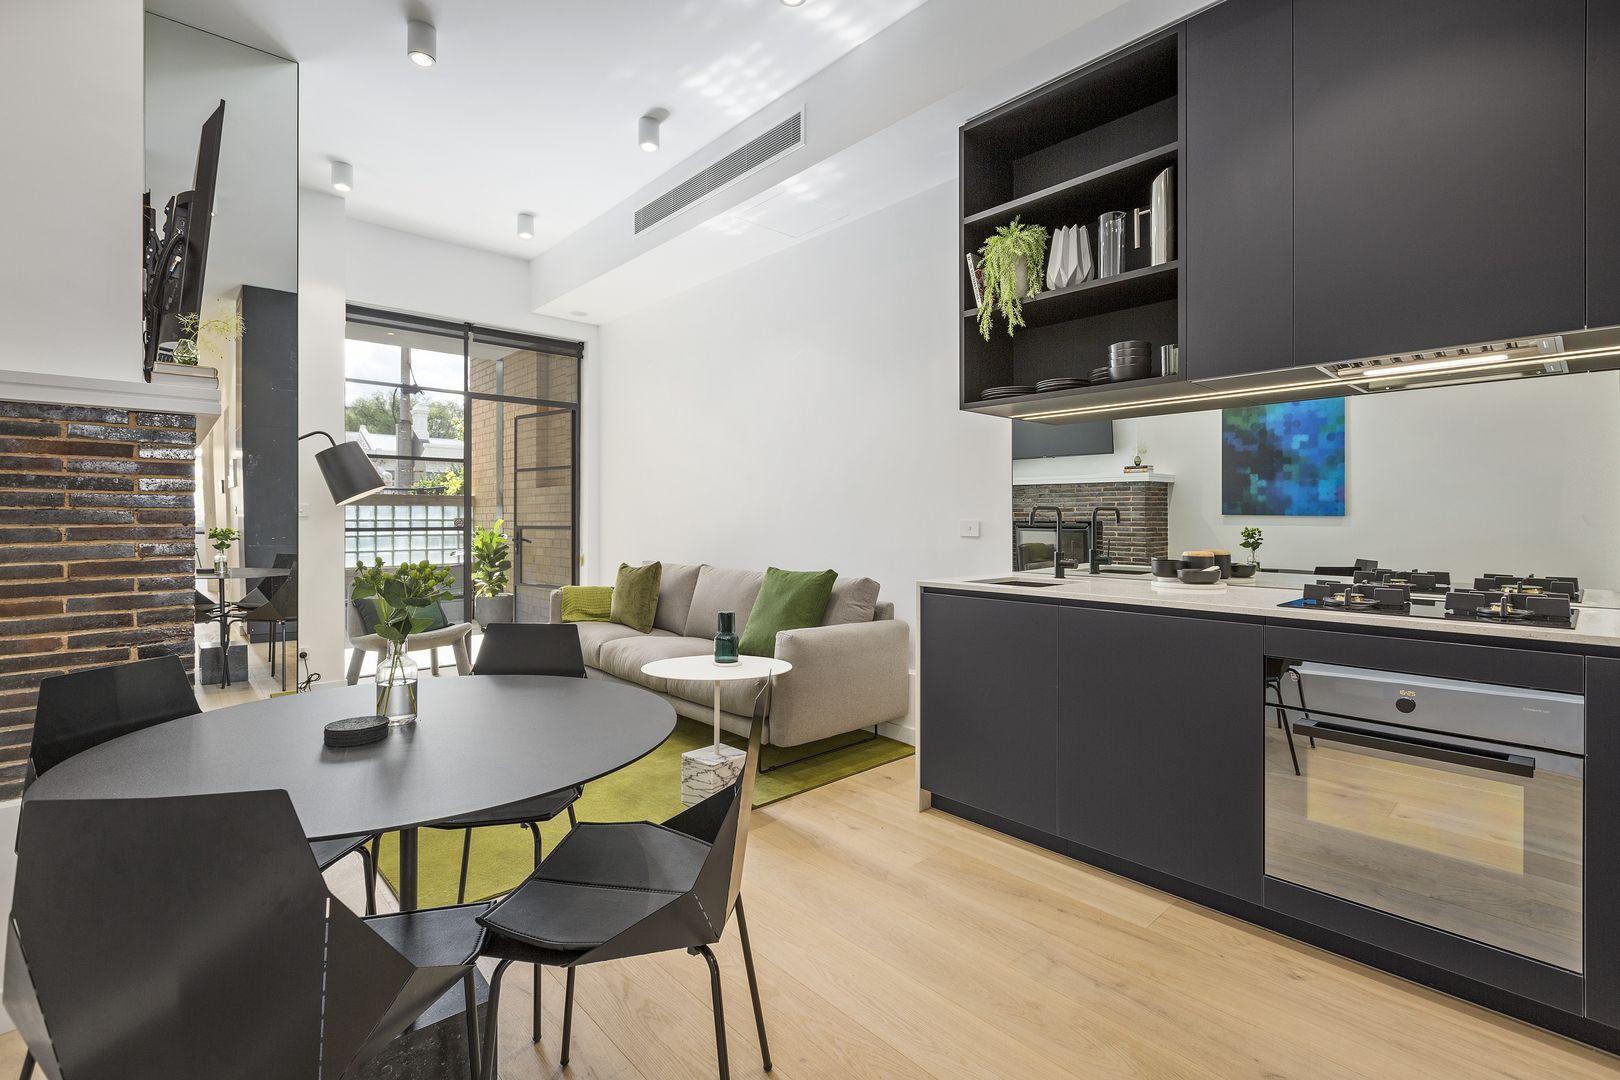 1/60 Simpson Street, East Melbourne VIC 3002, Image 0